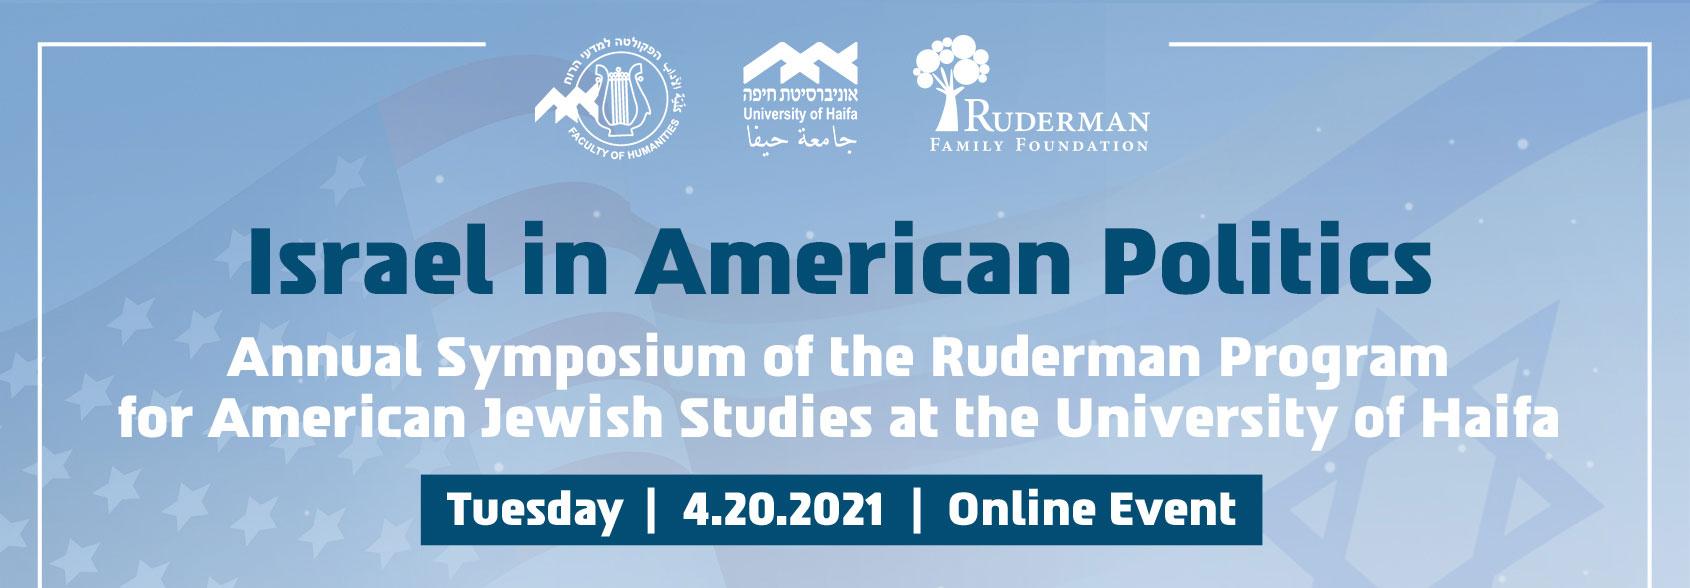 Annual symposium of the Ruderman program for Jewish American studies at the university of Haifa